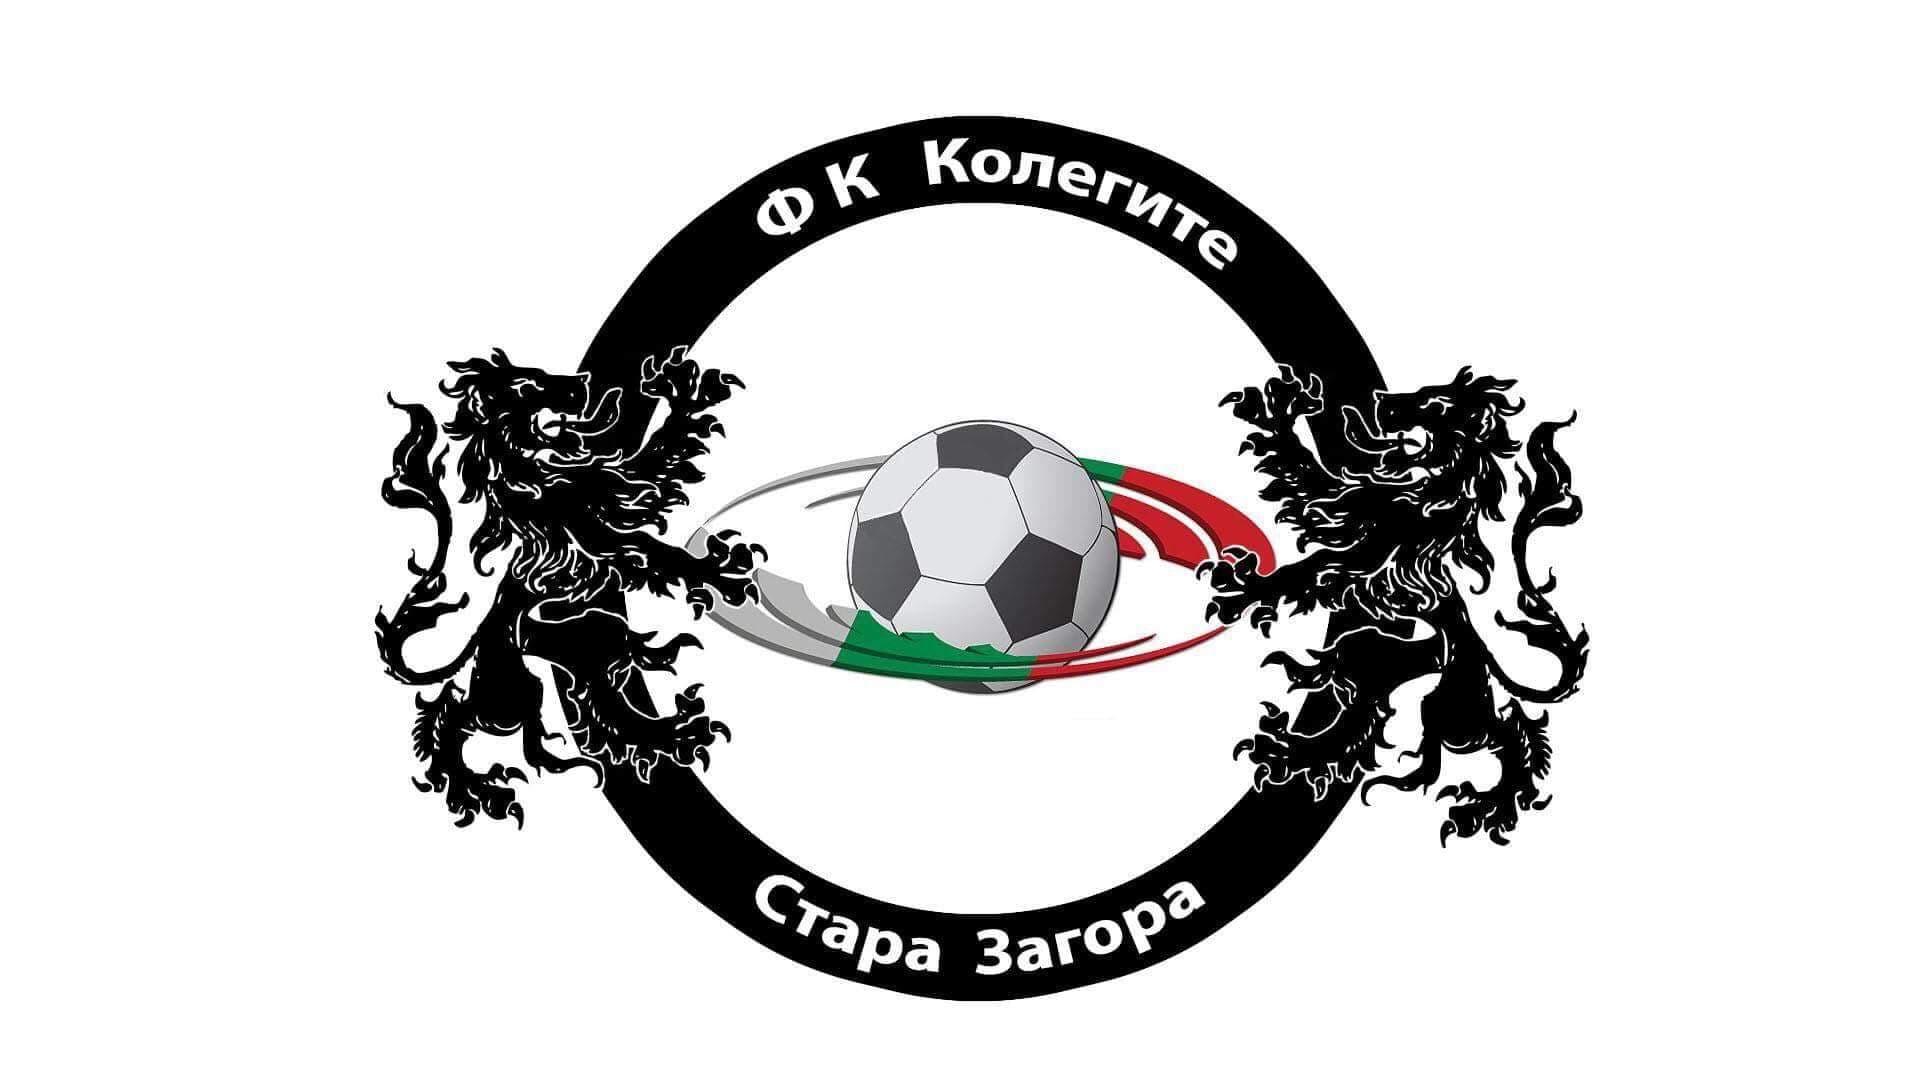 ФК Колегите